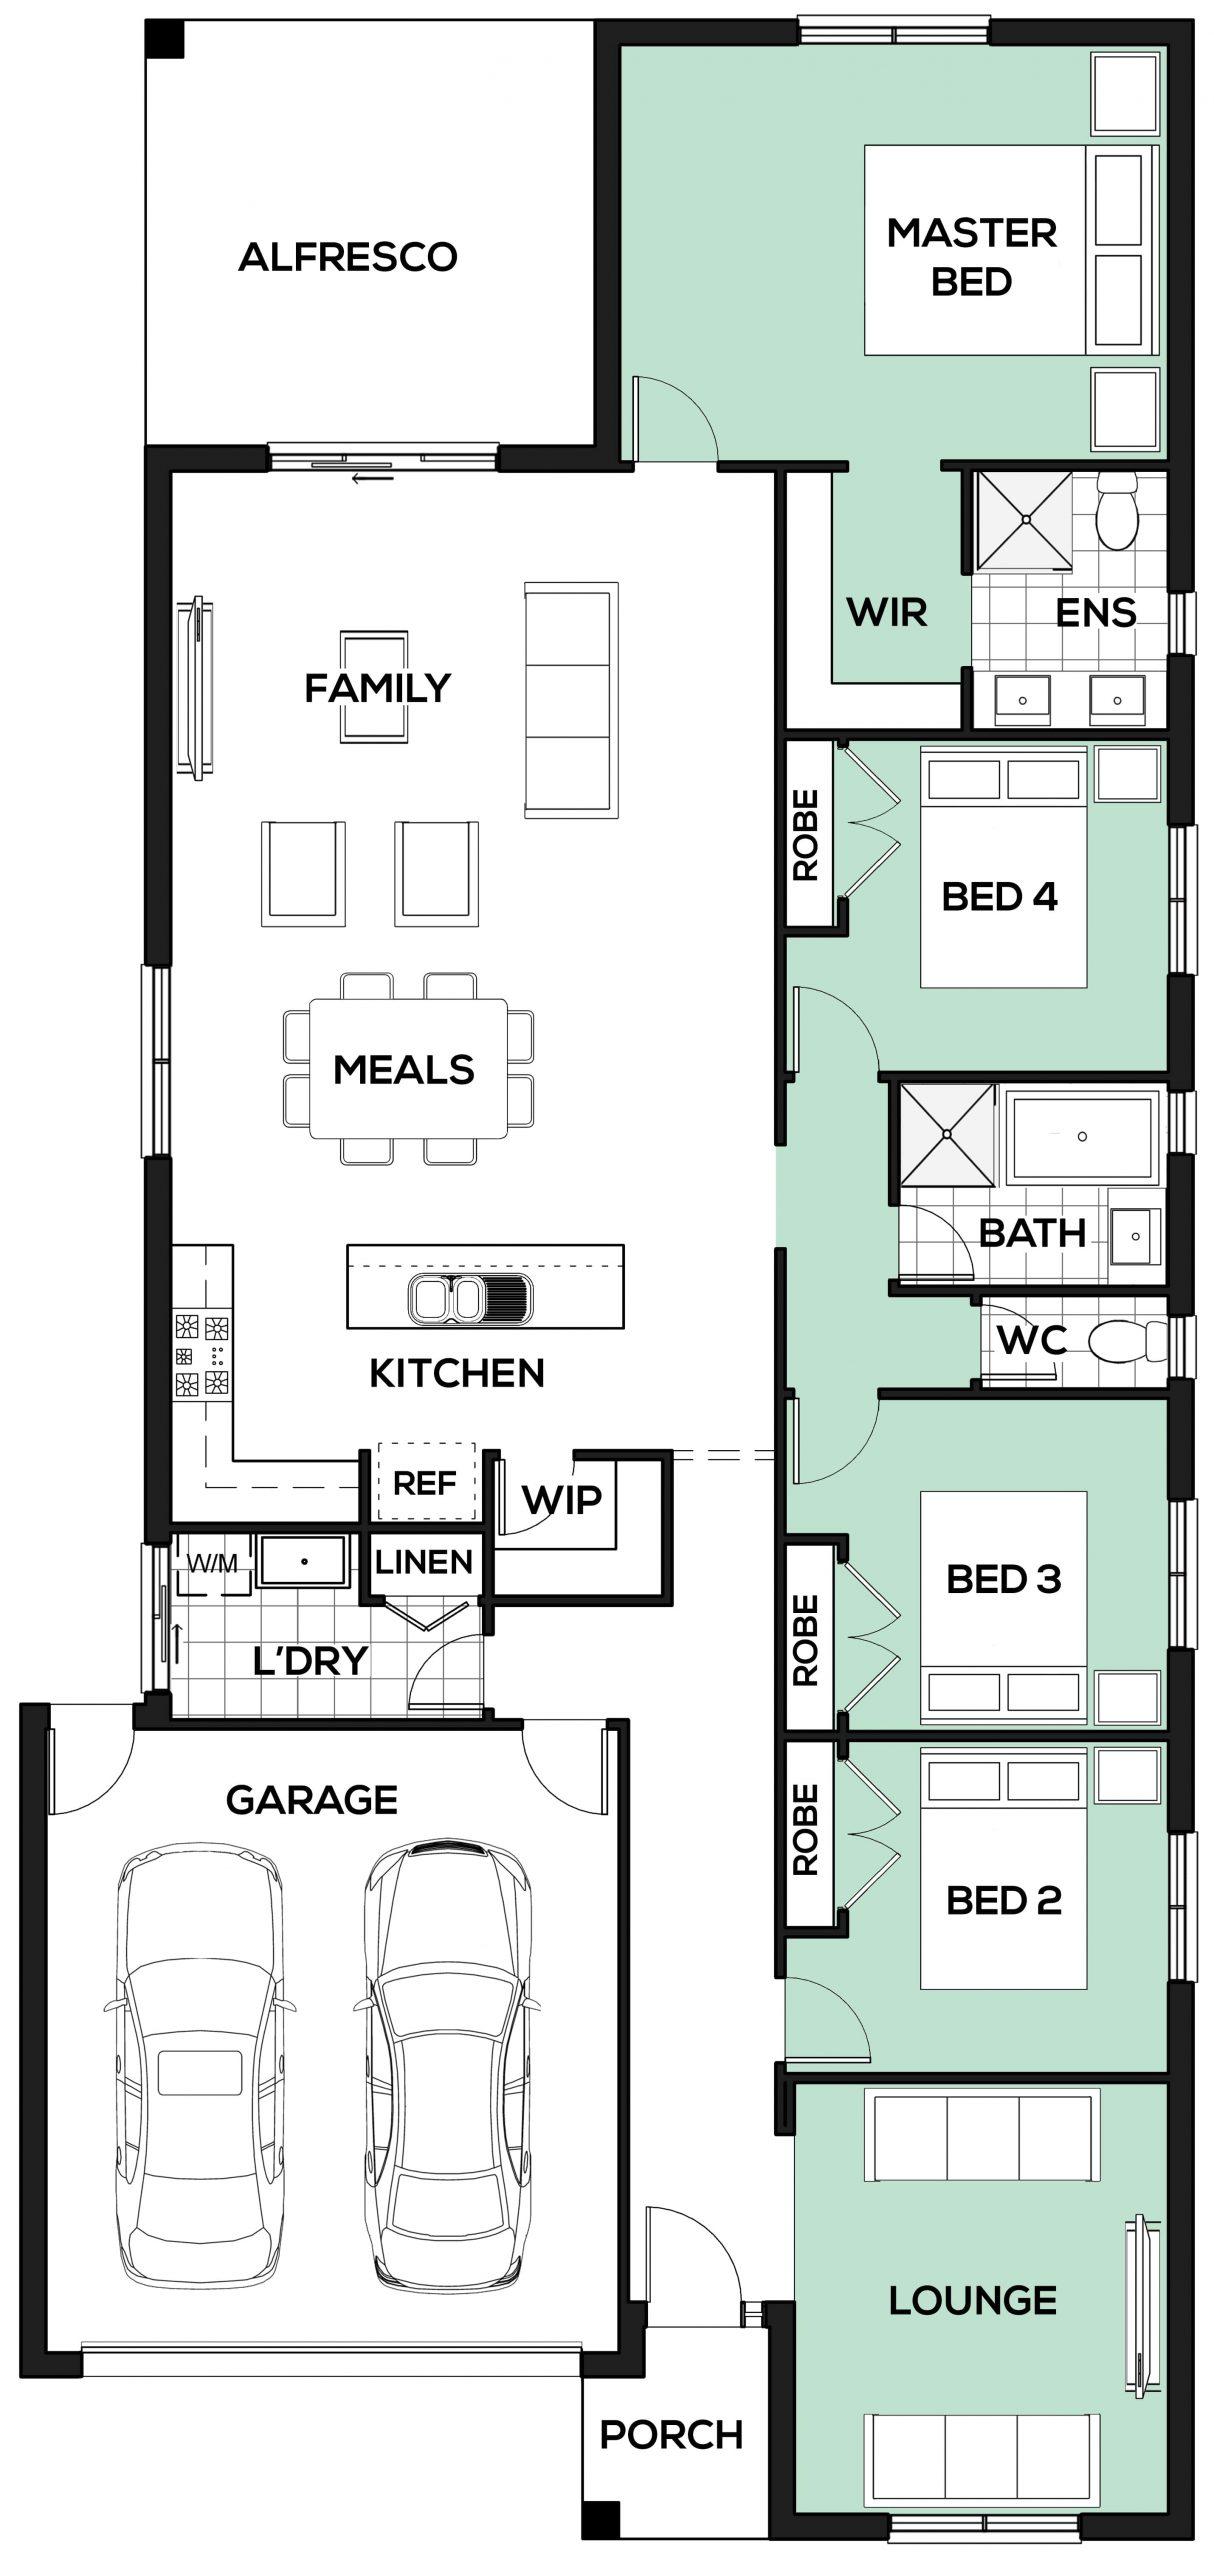 Lot 653 Westbourne Street, Melton